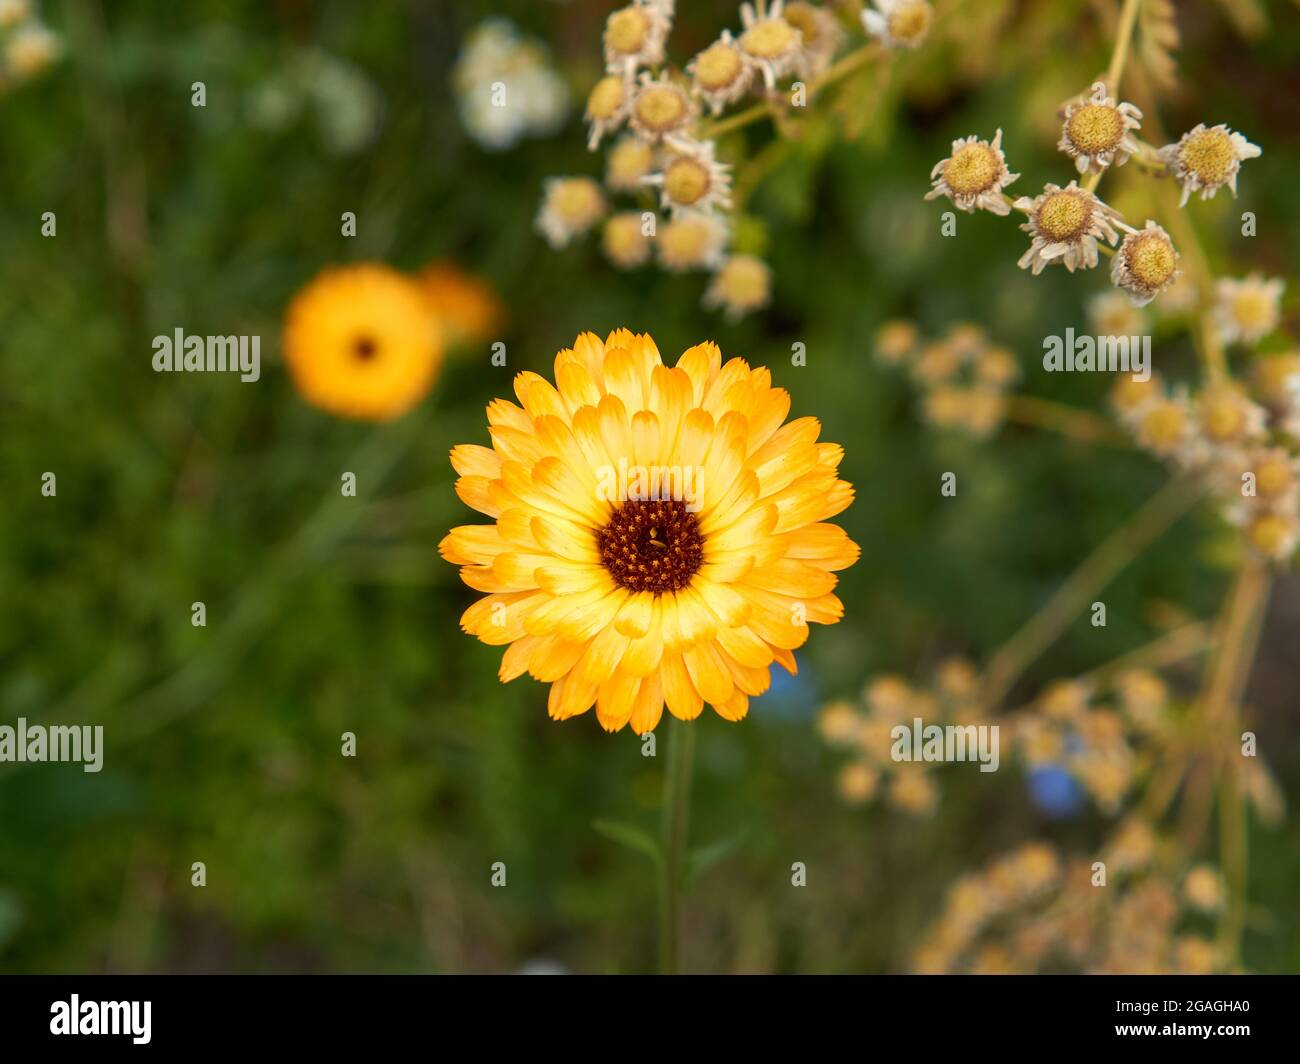 closeup-of-yellow-flower-blooming-in-summer-2GAGHA0.jpg